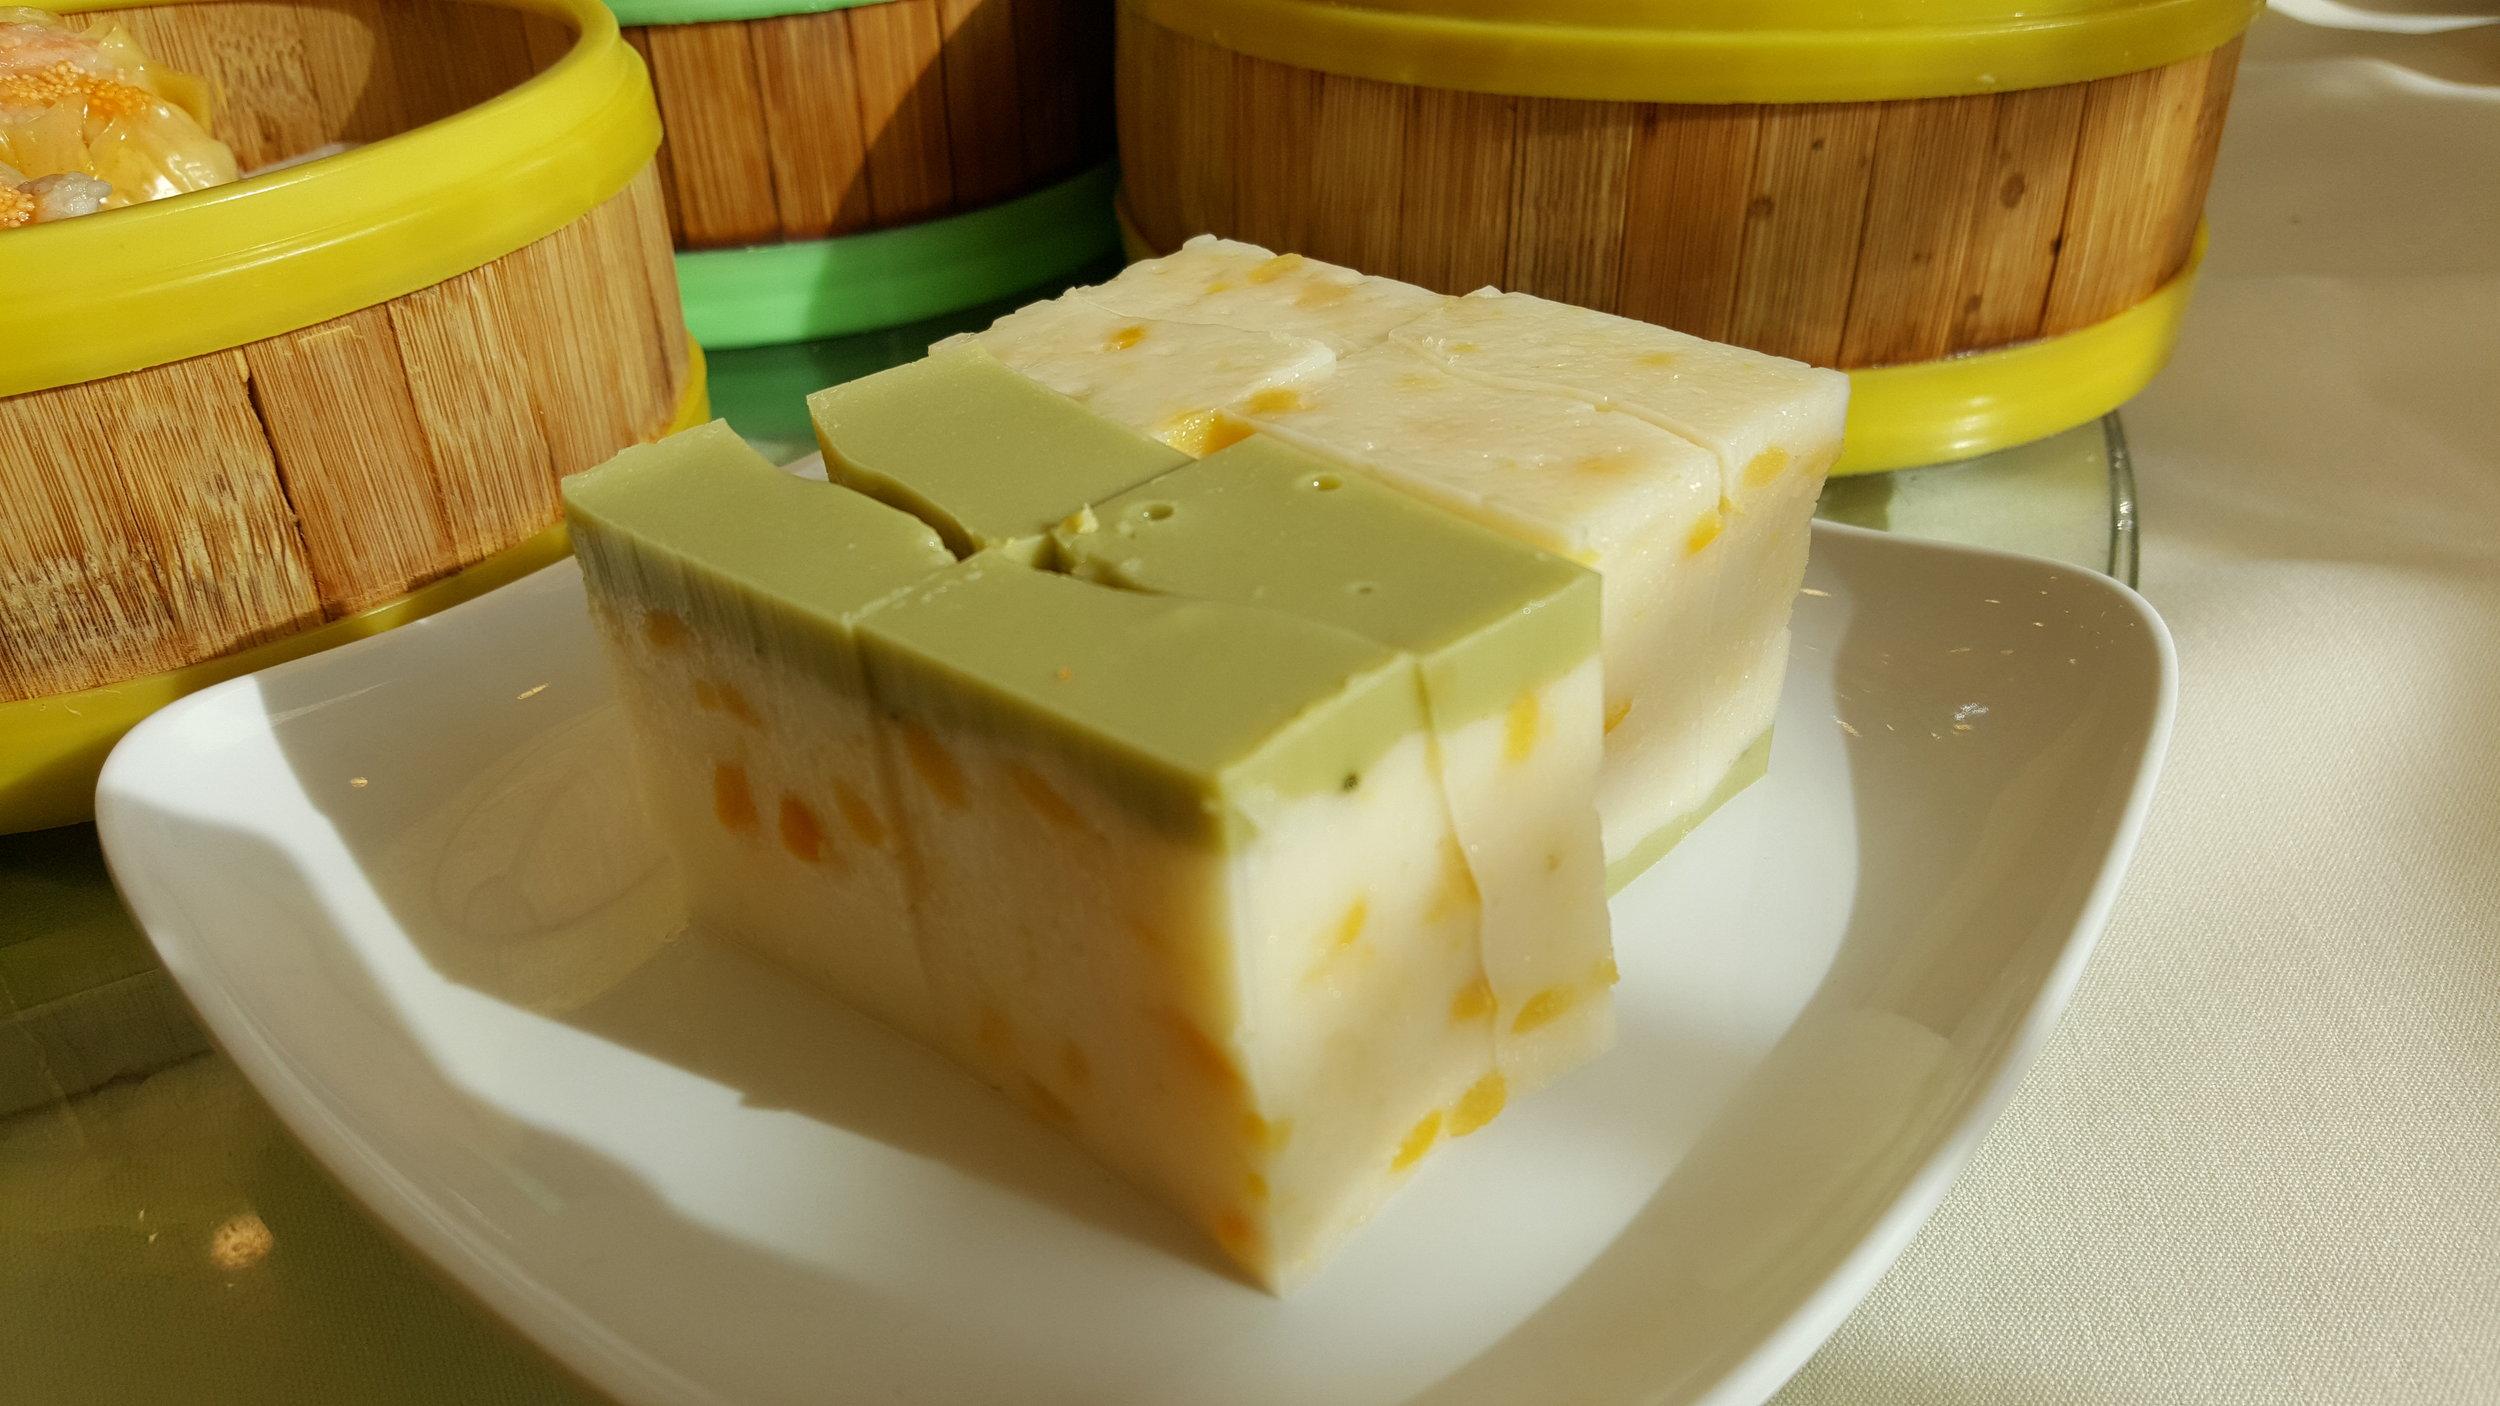 Mung Bean Coconut Flavor Pudding